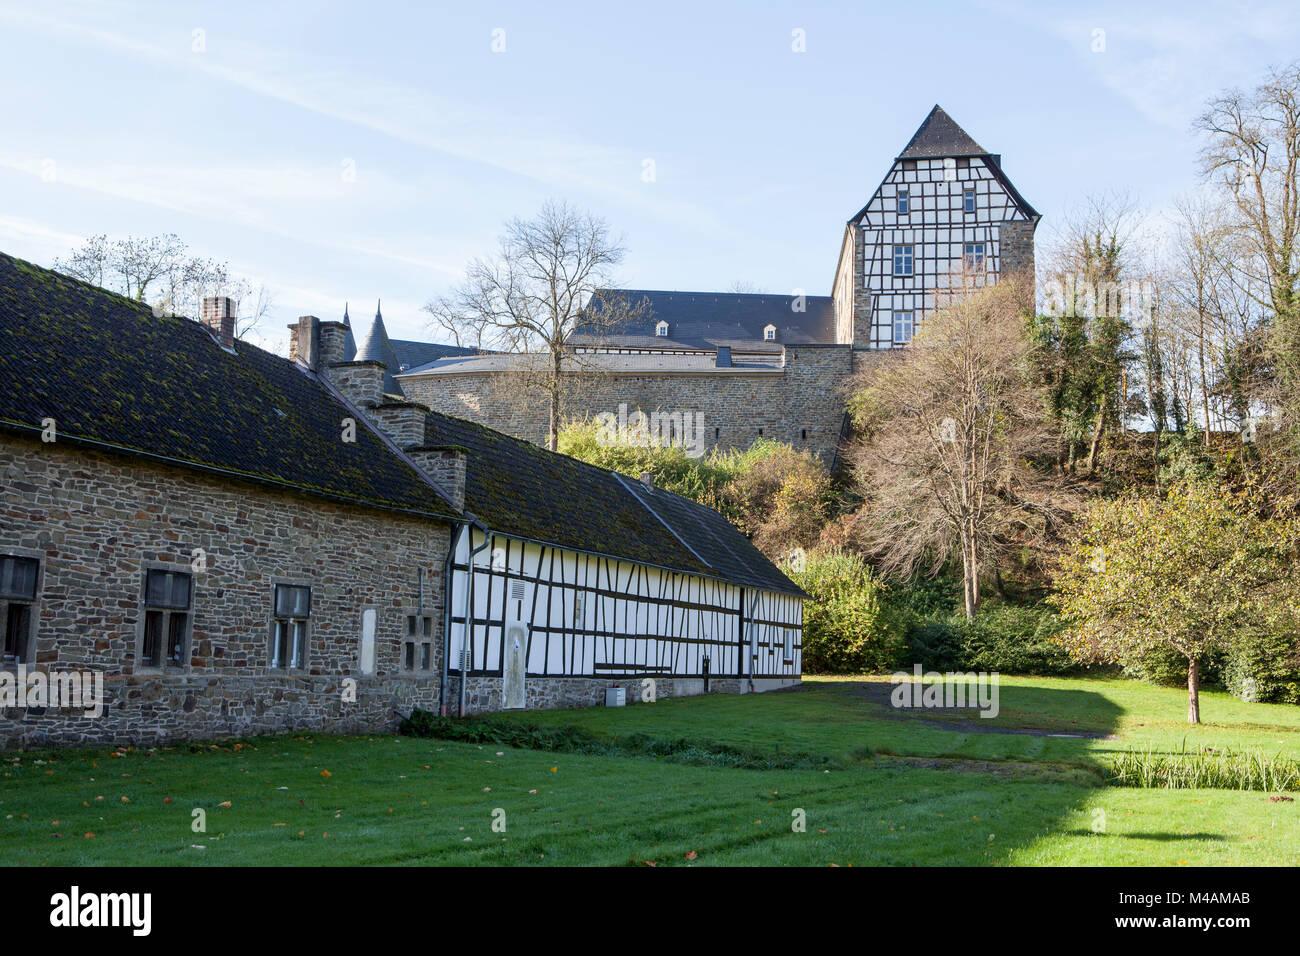 Herrnstein castle, North Rhine-Westphalia, Germany - Stock Image